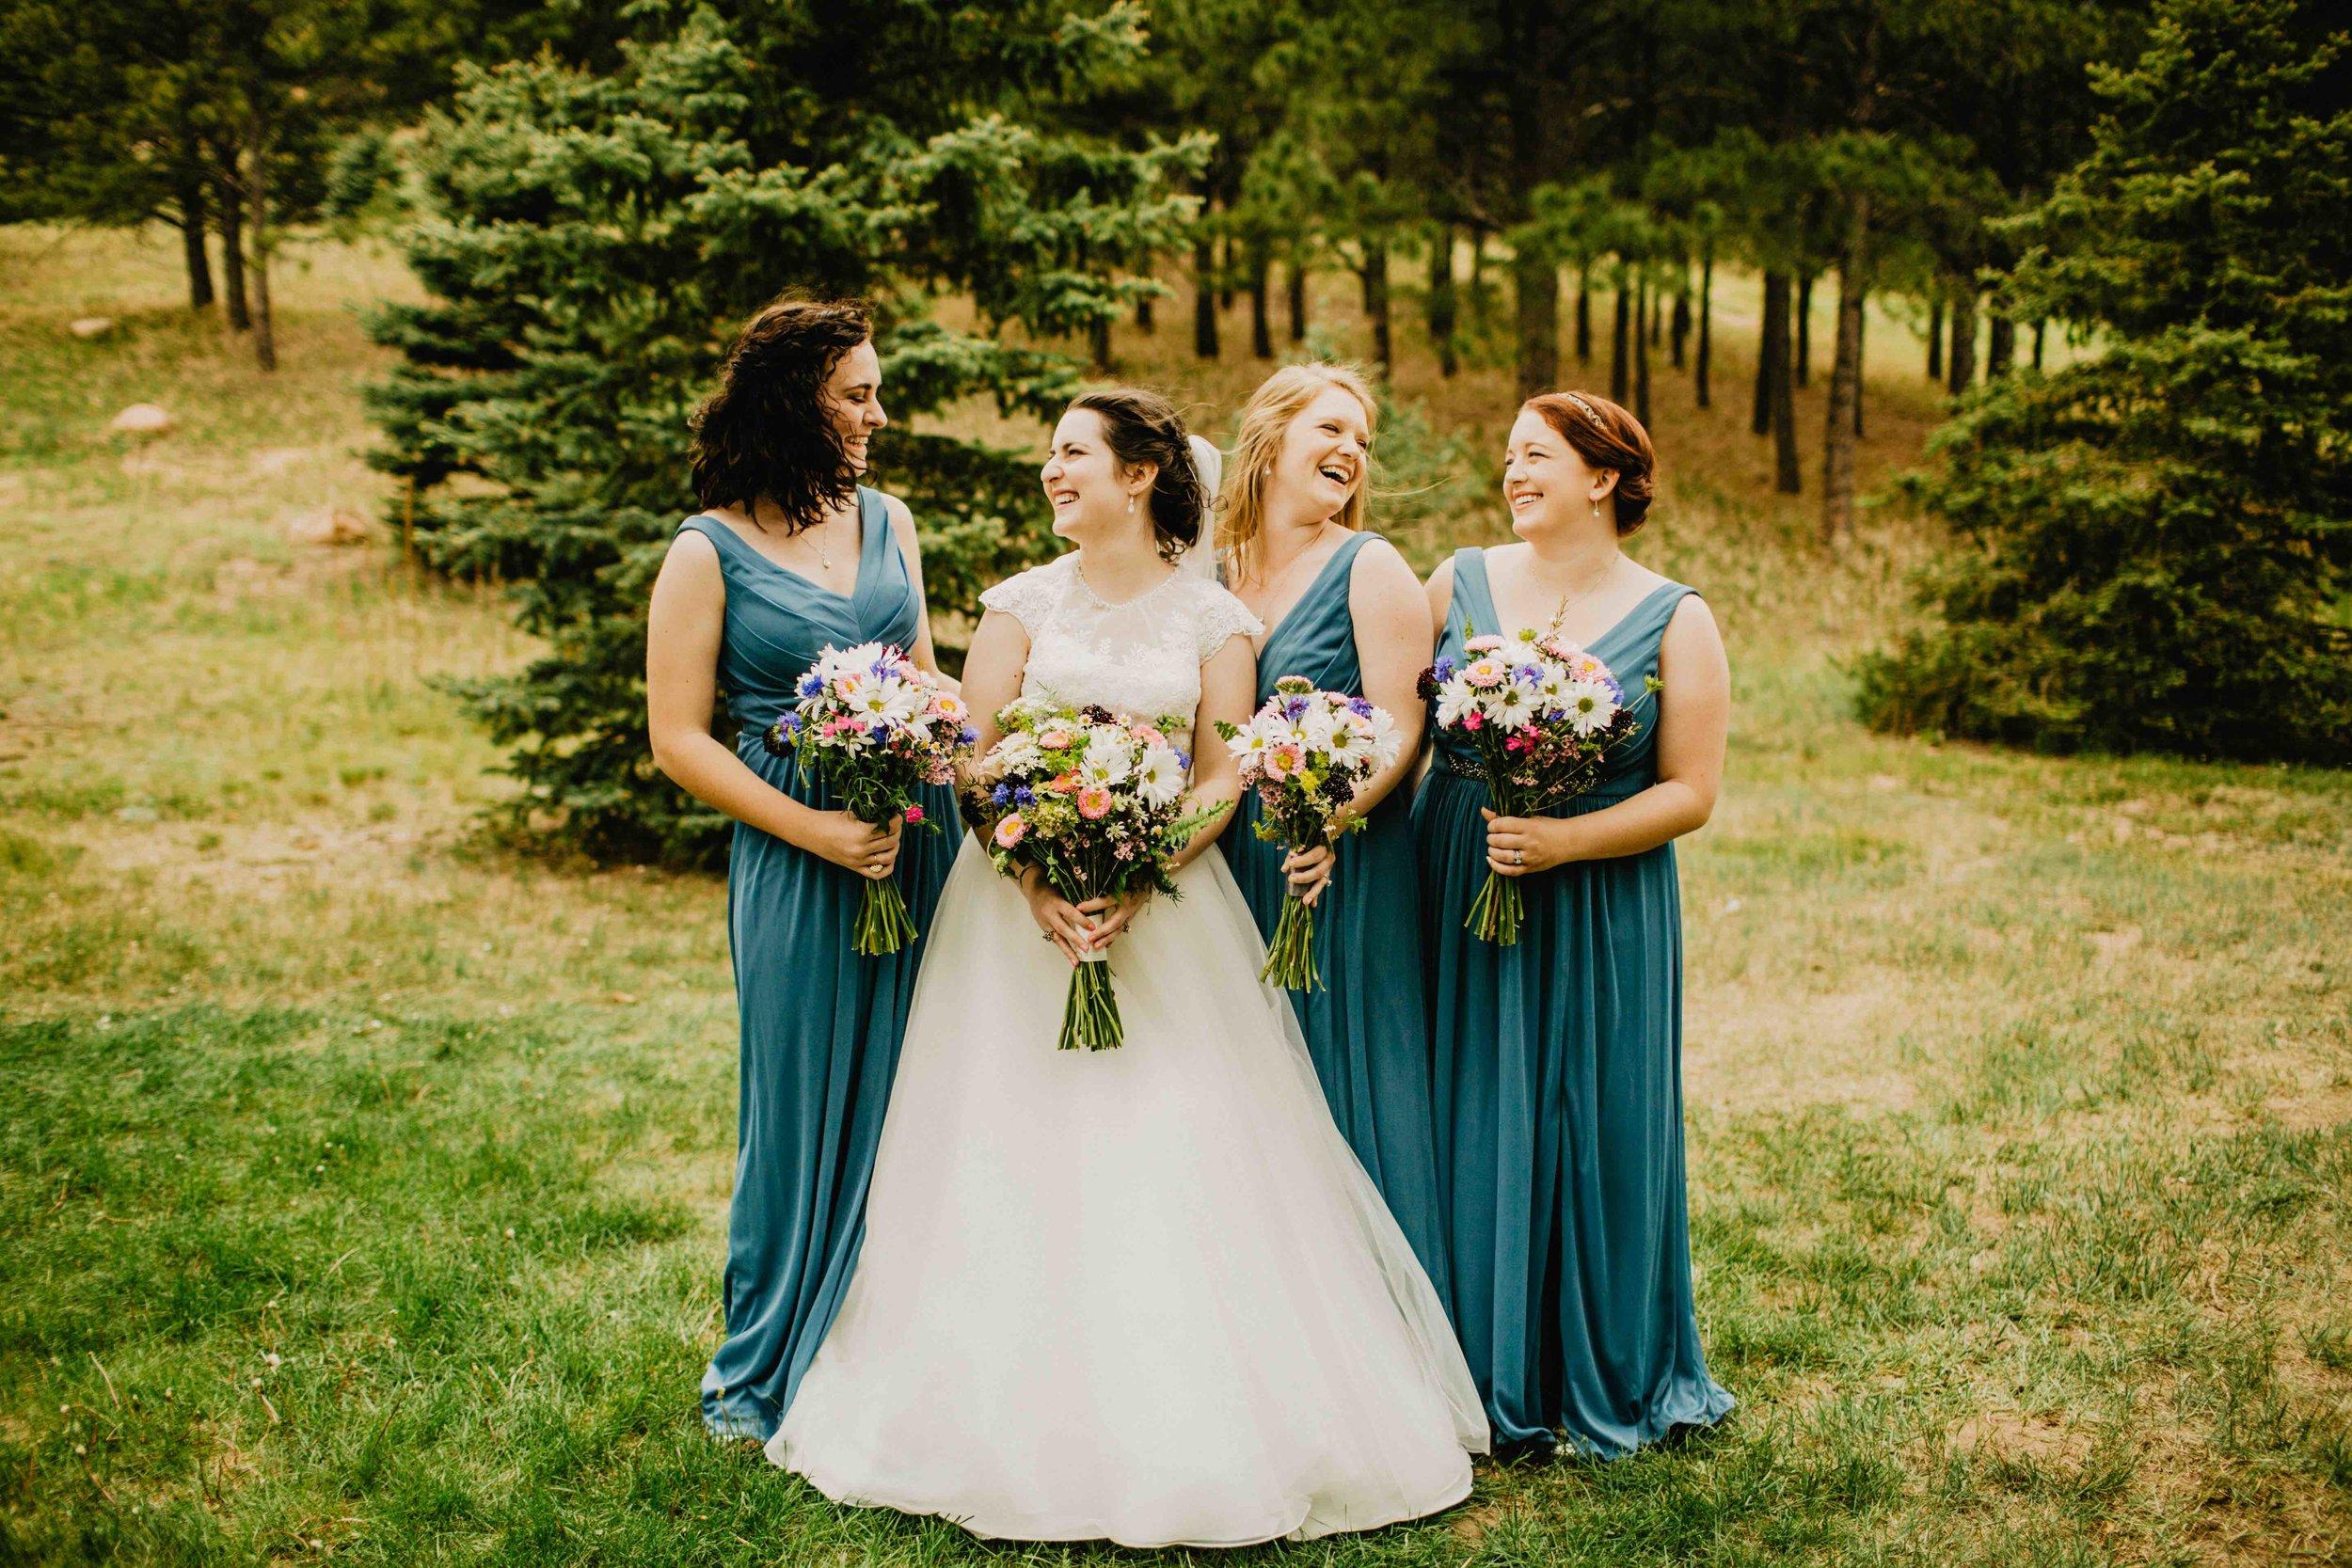 607A5802-colorado-wedding-photographer-denver-springs-vail--colorado-wedding-photographer-denver-springs-vail-.jpeg